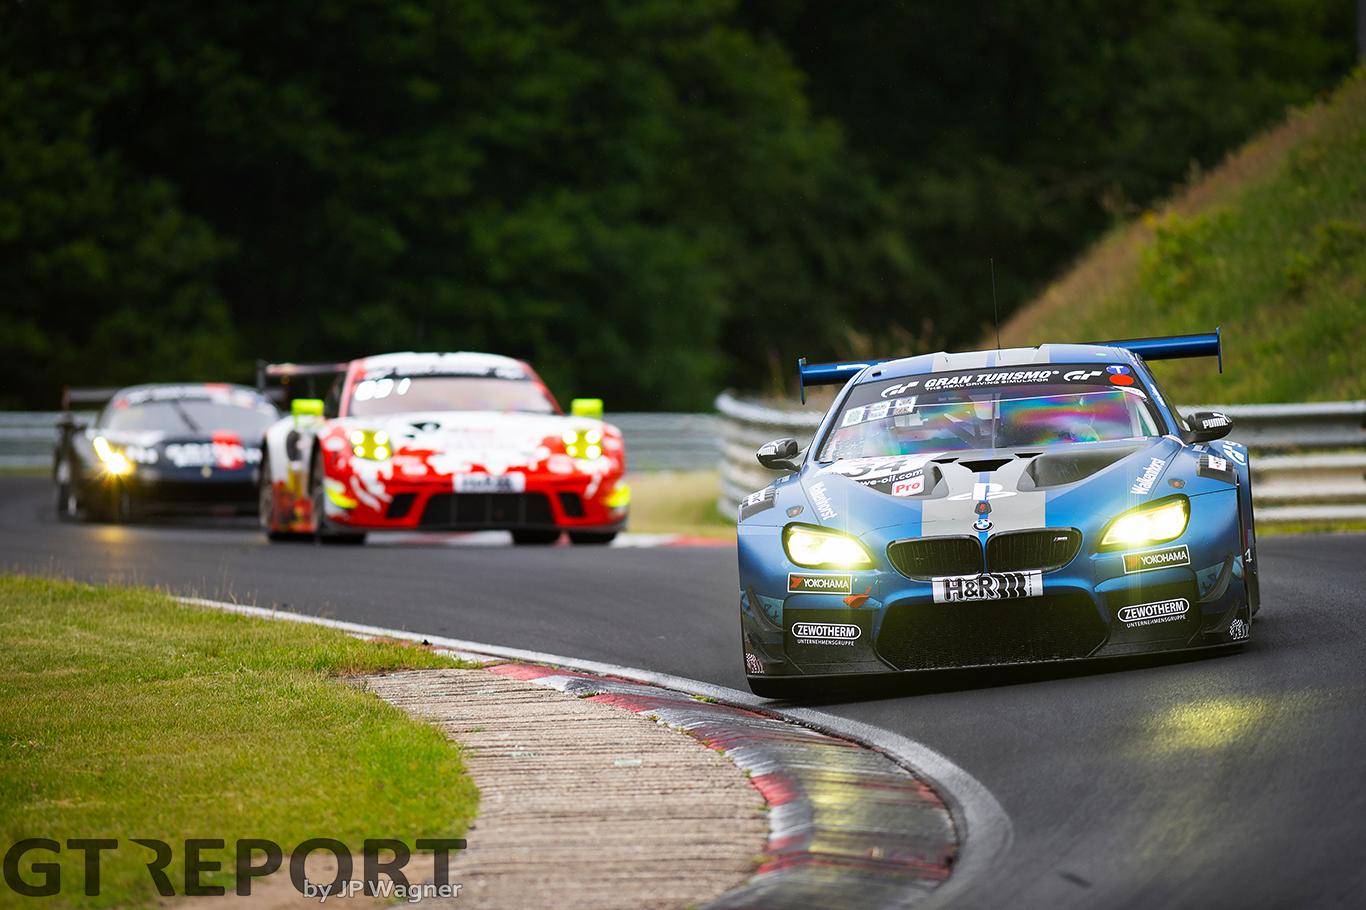 VLN1 race report: Walkenhorst wins after penalty Haupt Racing on final lap